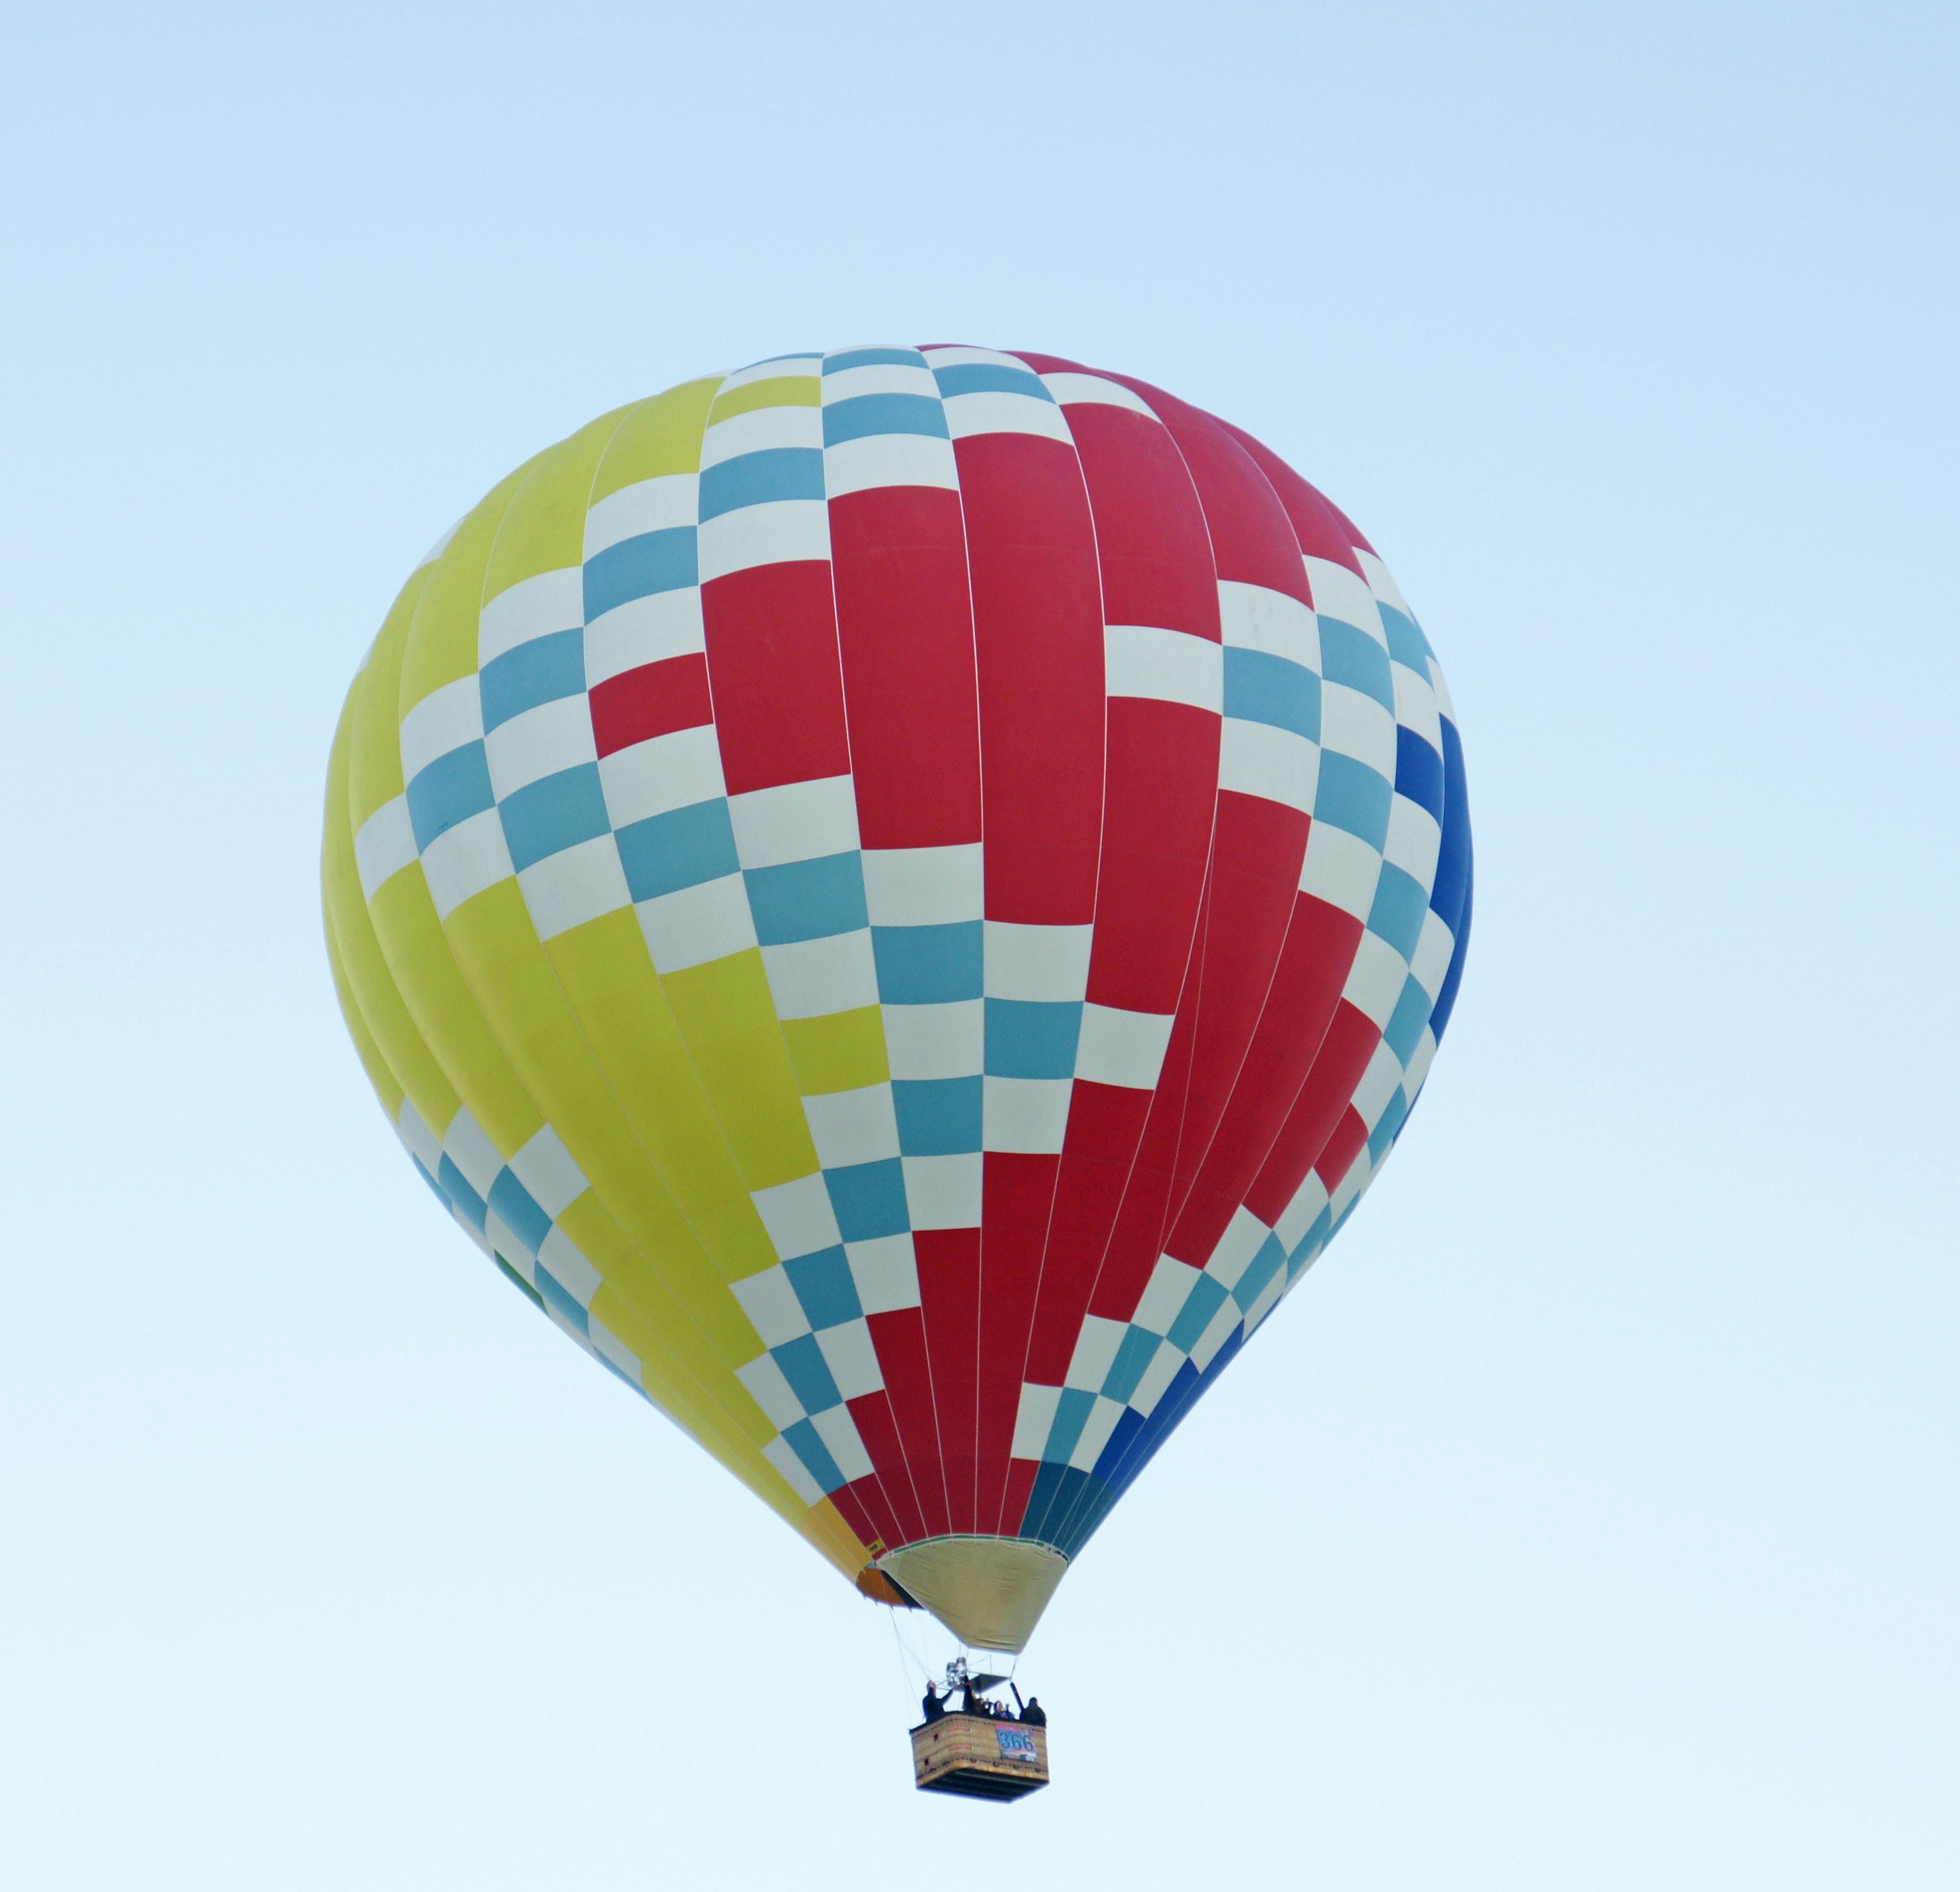 aibf-Single-Balloons-Gallery04